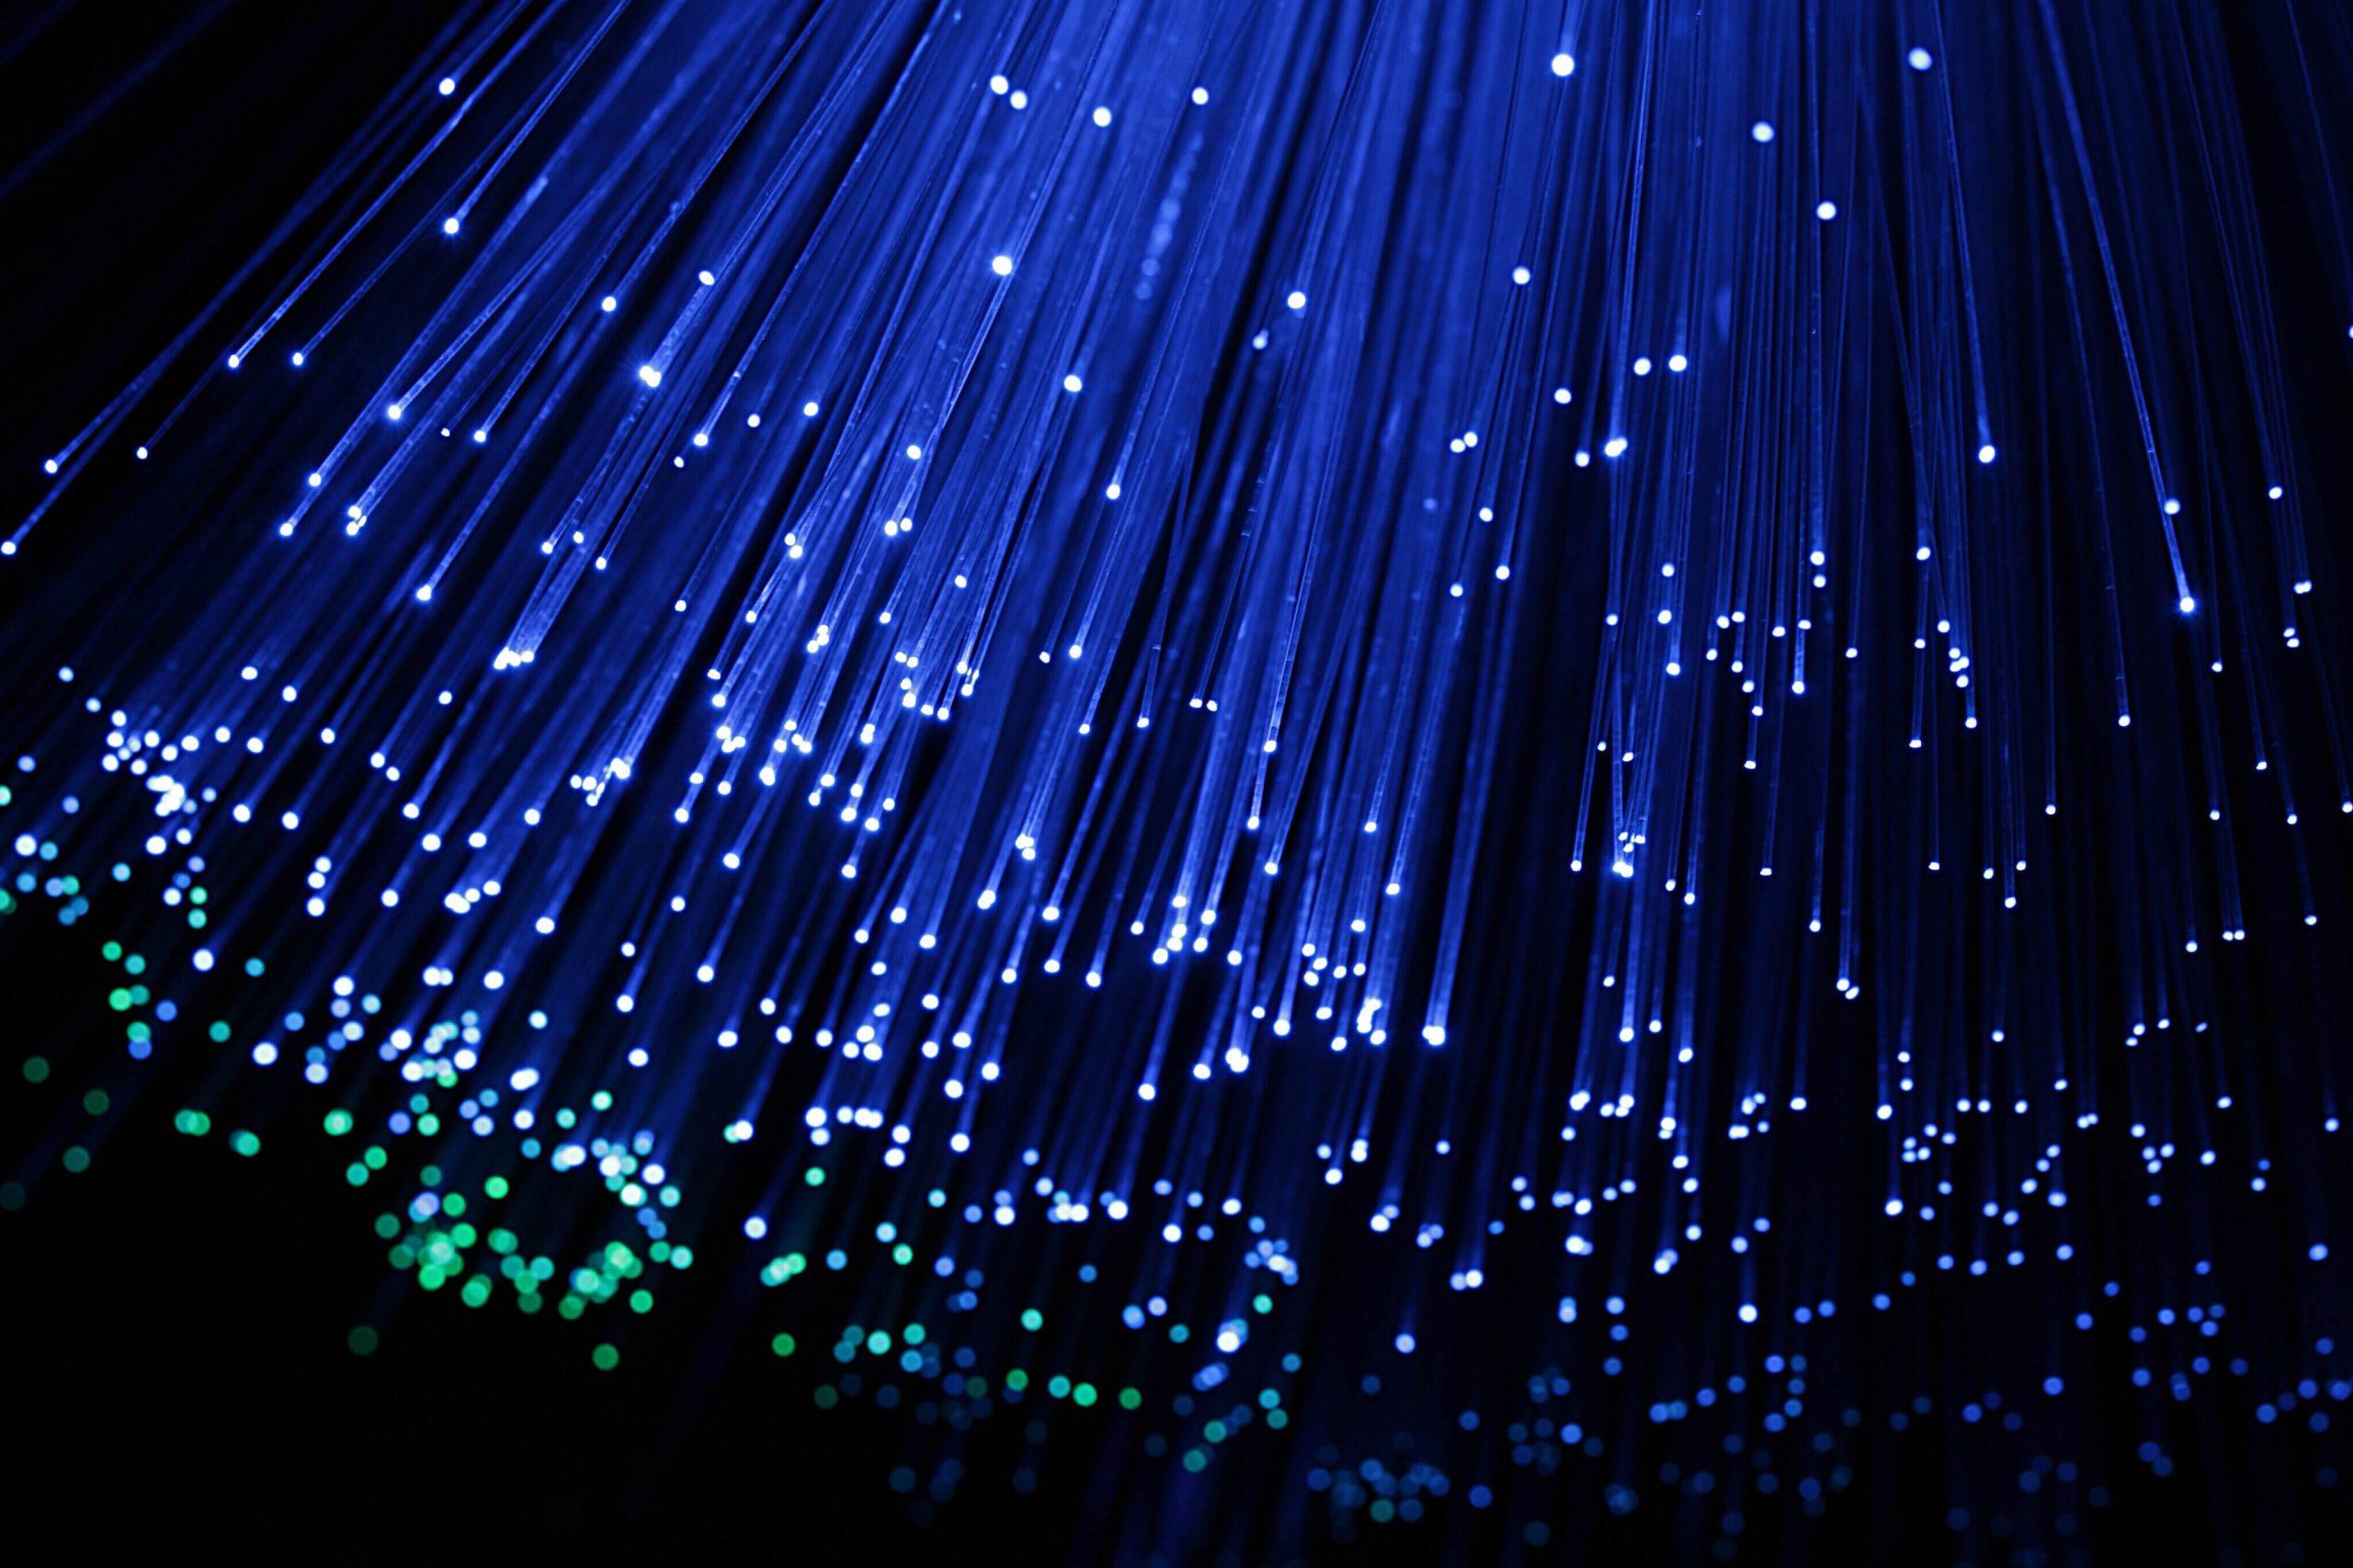 fiber optics in water